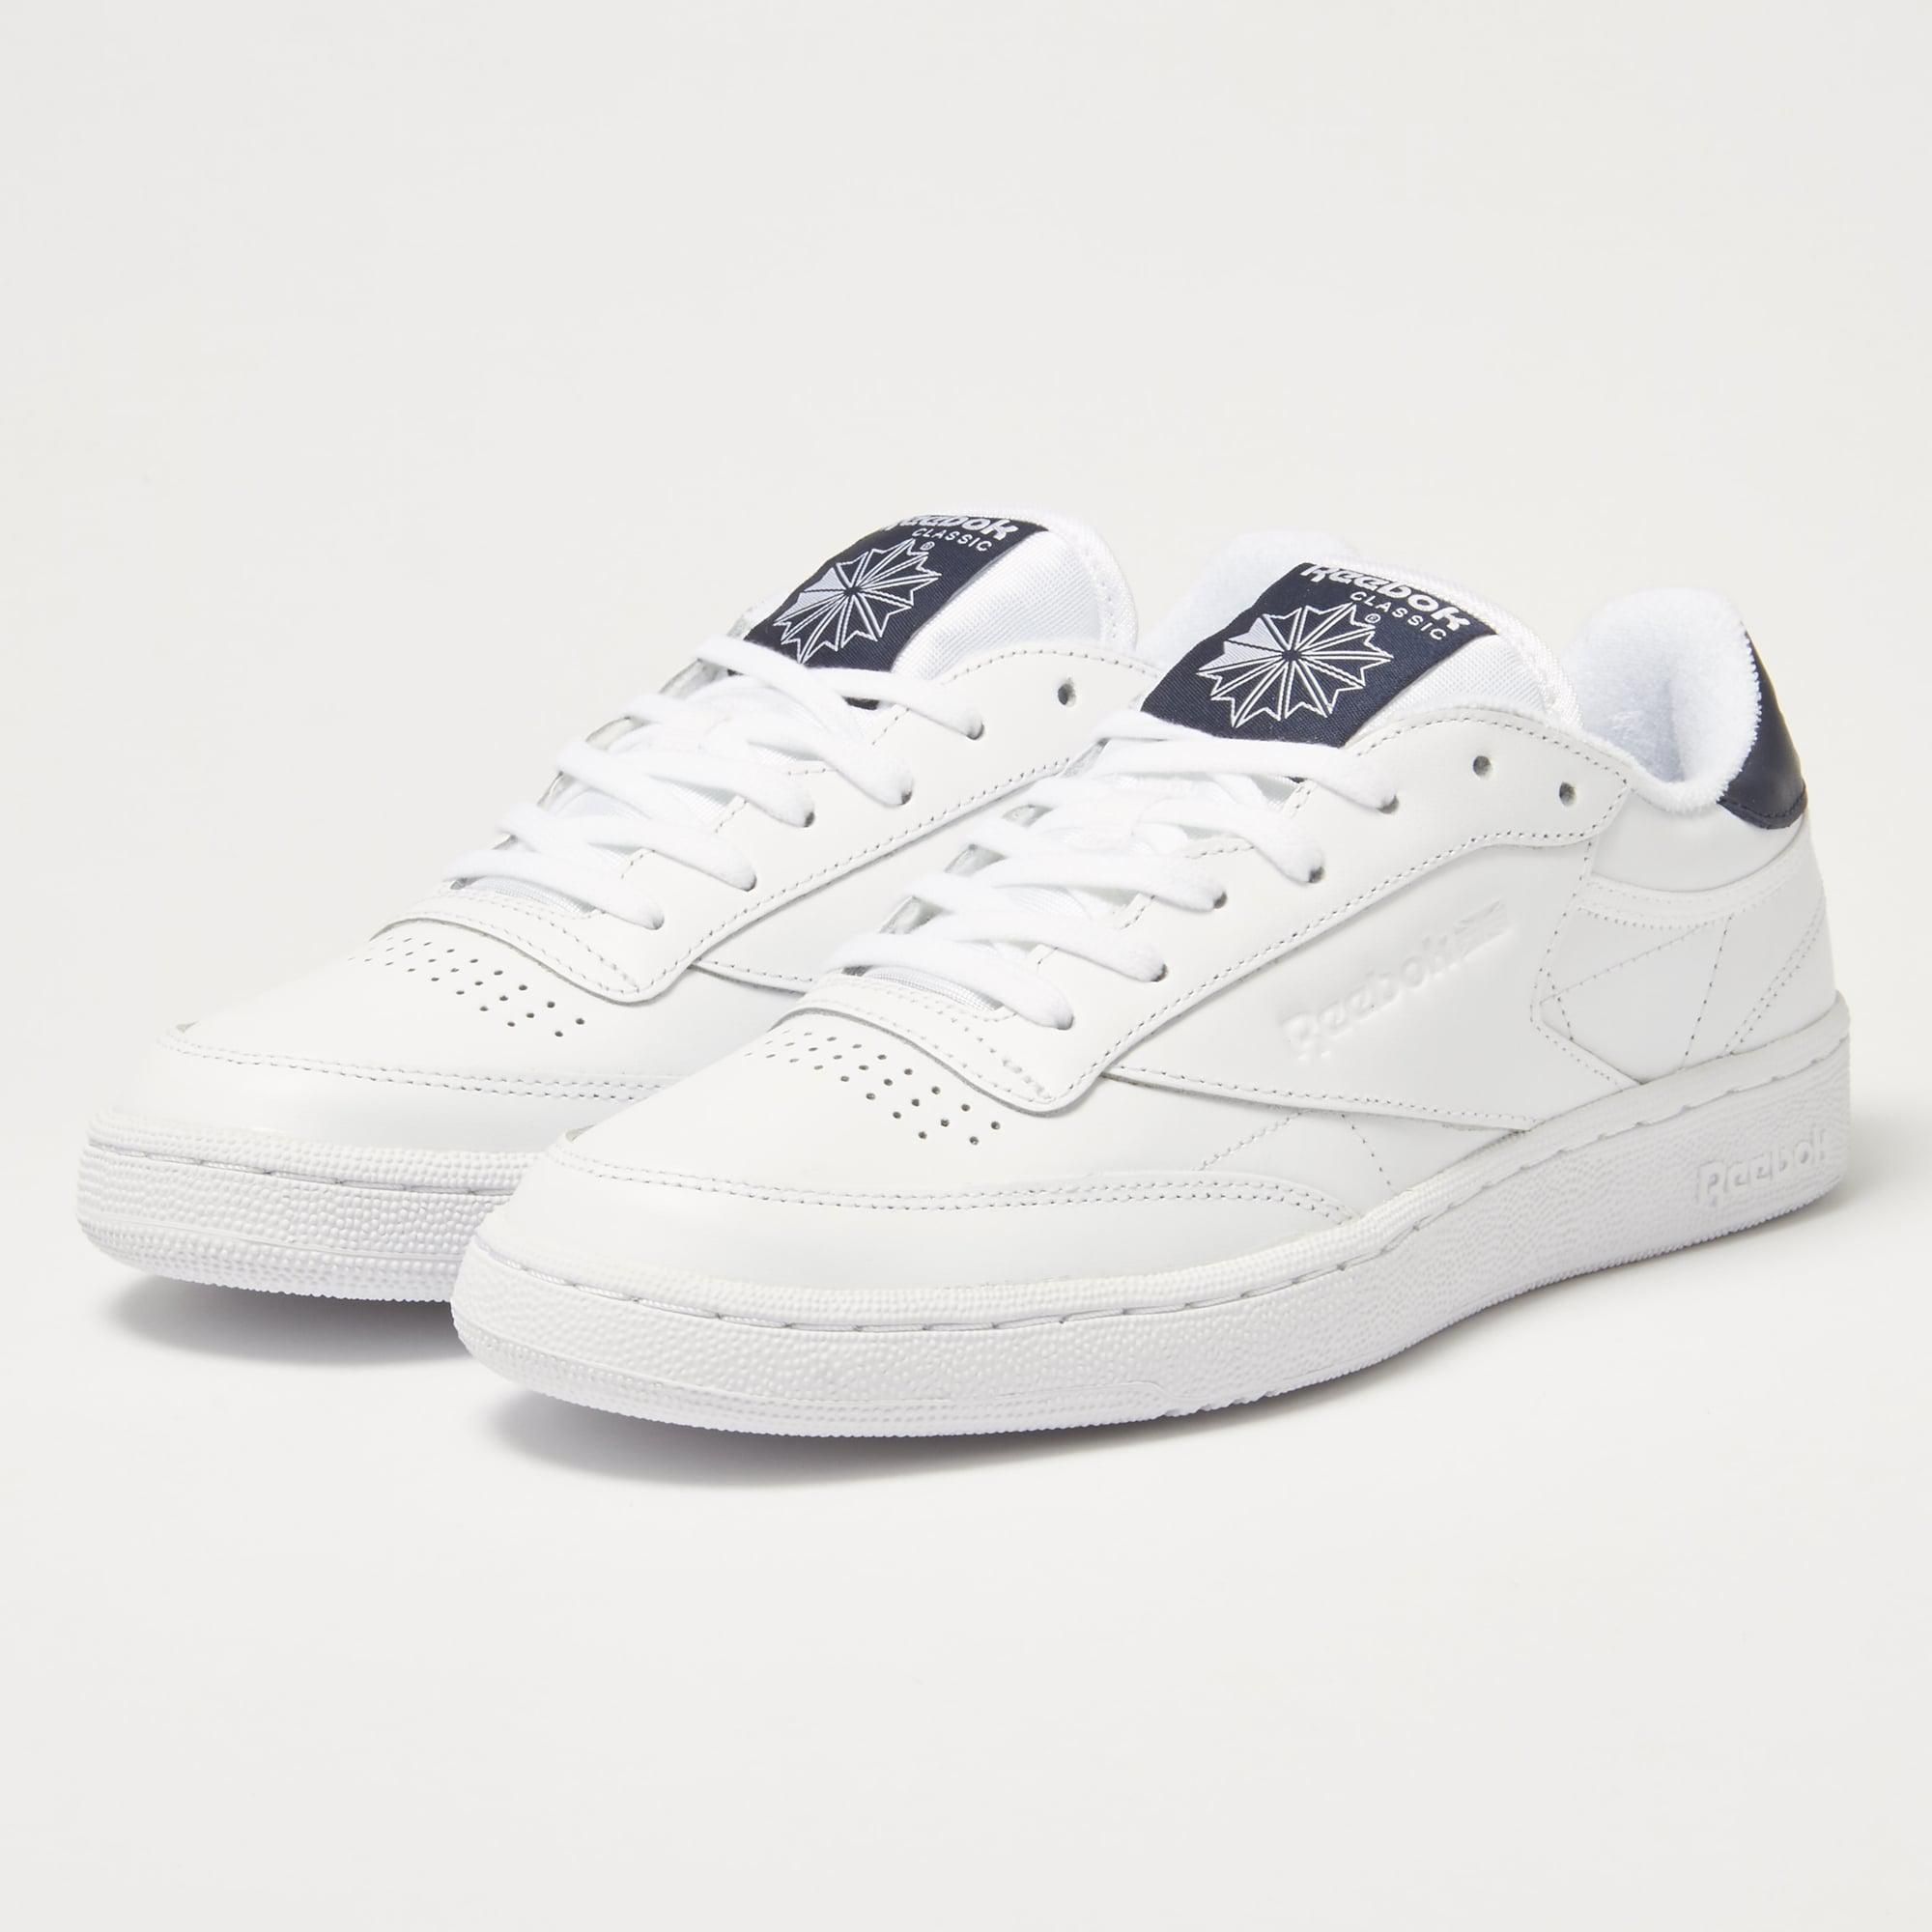 lyst reebok club c85 el white sneakers in white for men. Black Bedroom Furniture Sets. Home Design Ideas